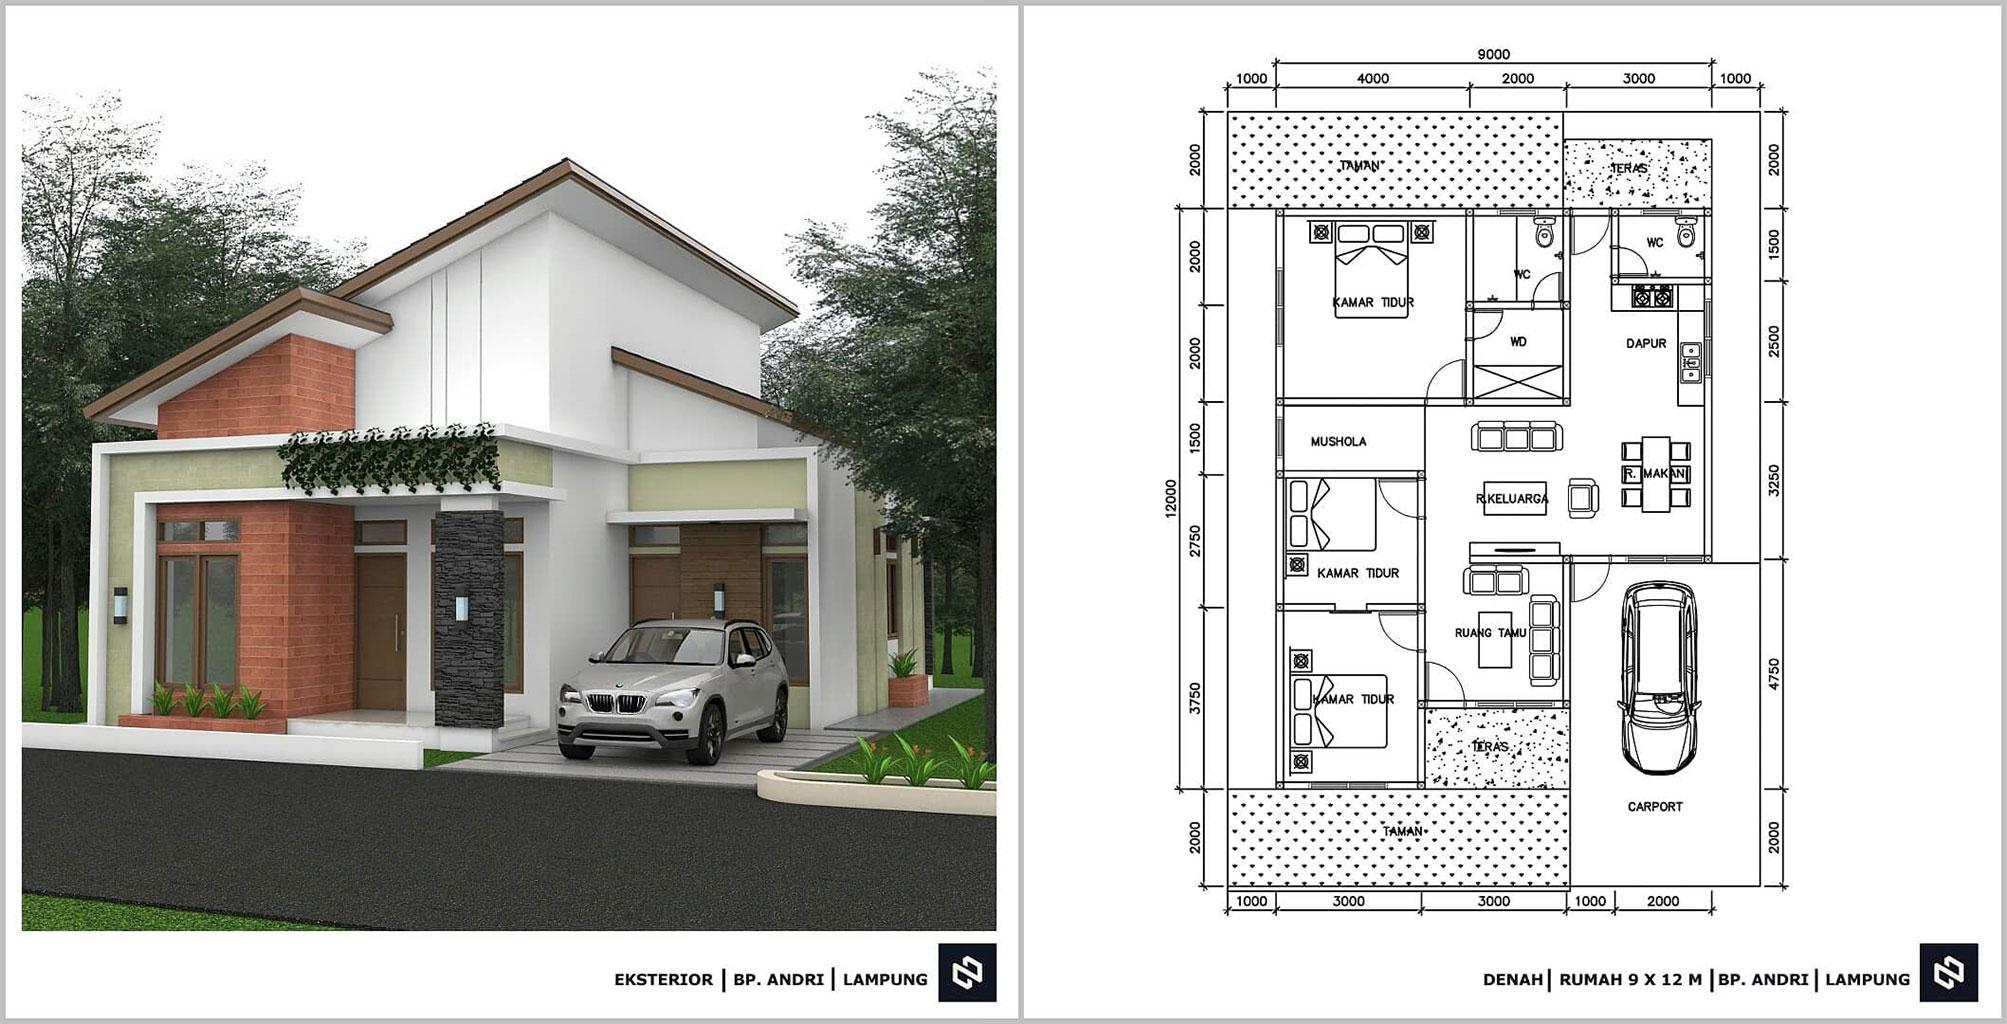 Denah Rumah Minimalis 3 Kamar Tidur 1 Lantai Terbaru Beserta Keterangannya Ukuran 9 x 12 m